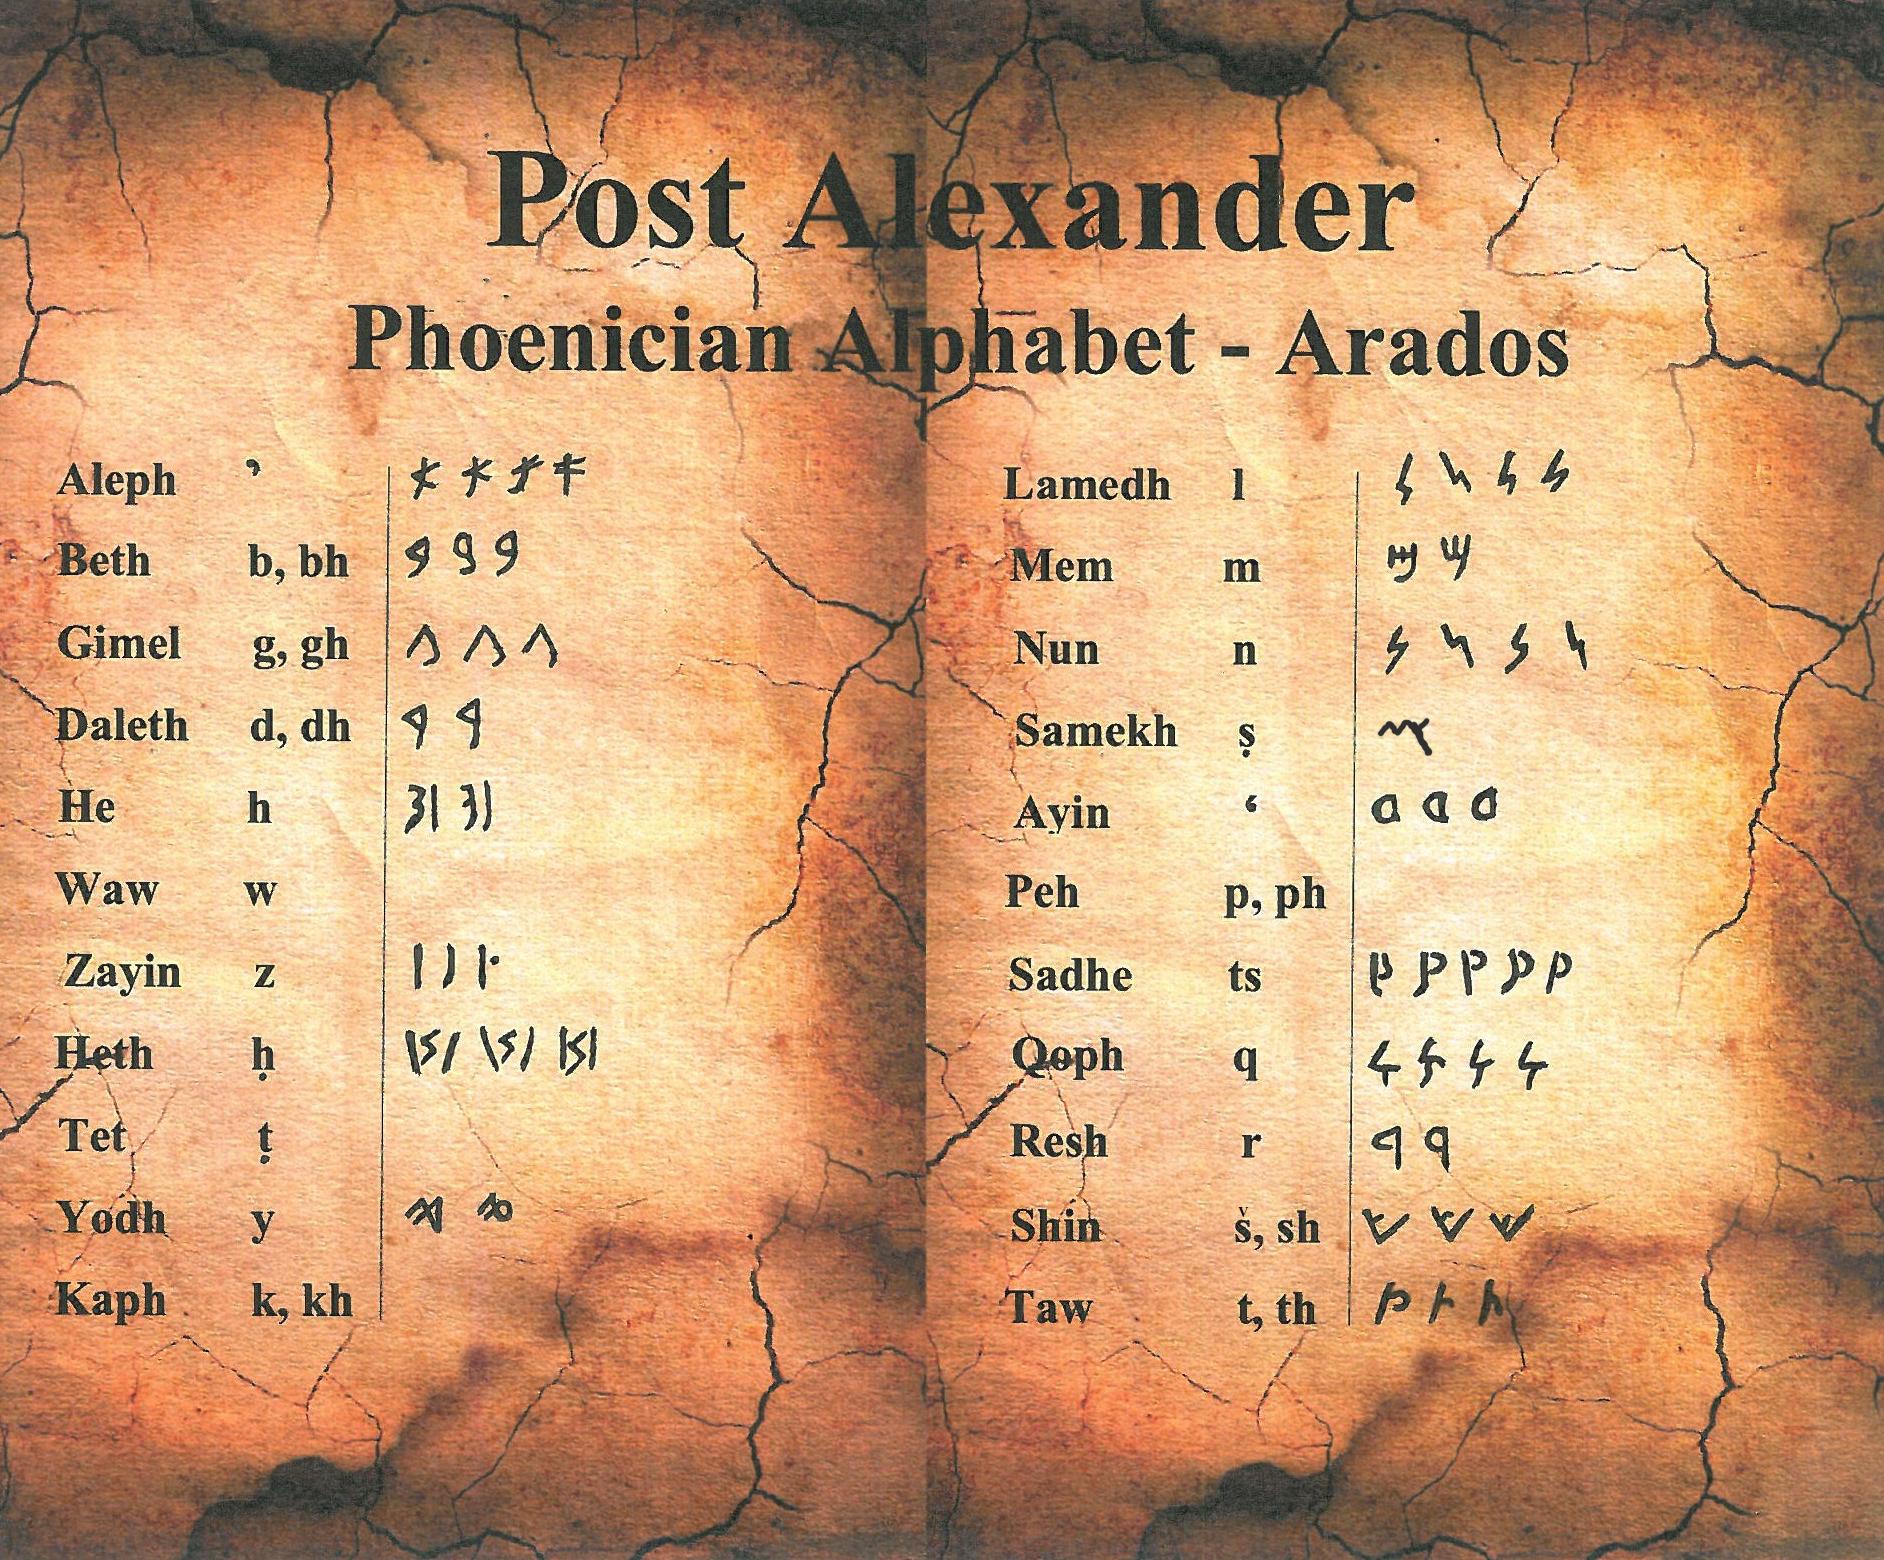 Aradian Alphabet.jpg